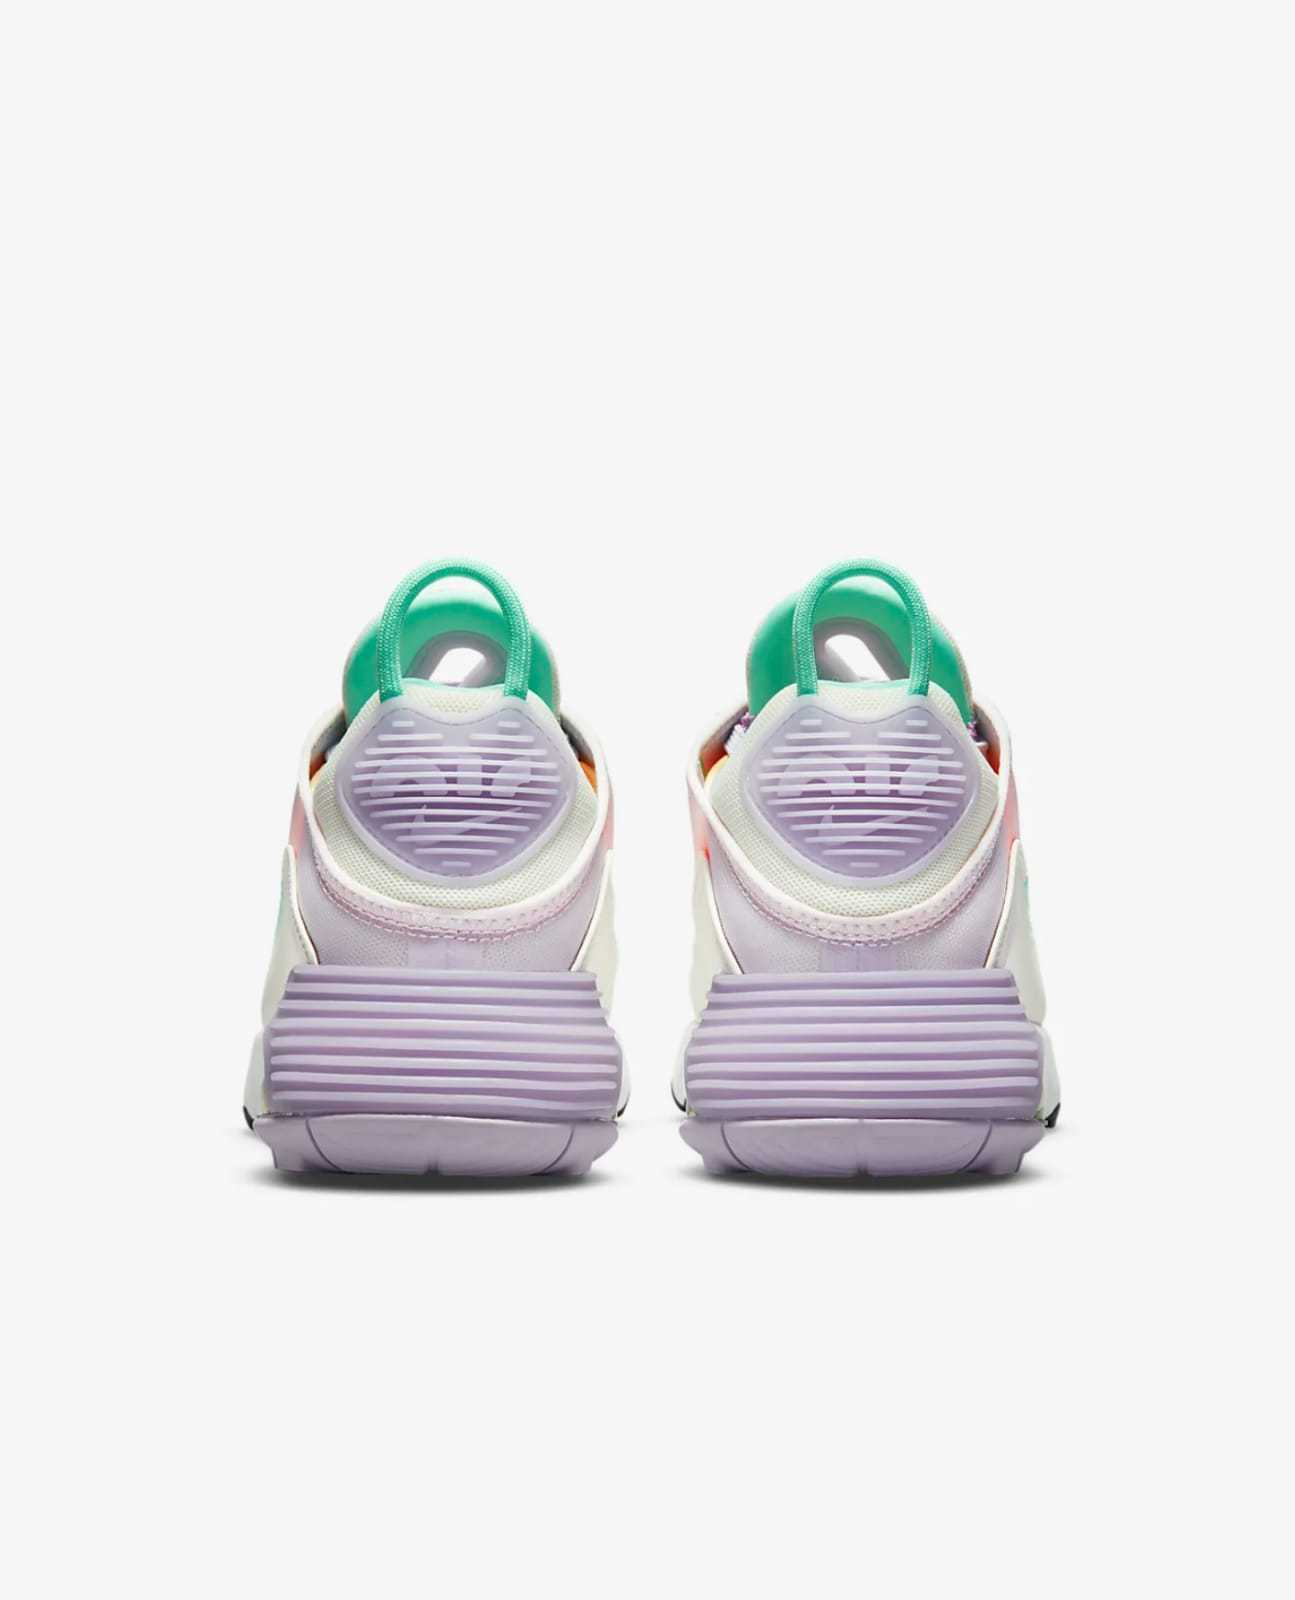 Nike AIR MAX NIKE AIR MAX 2090